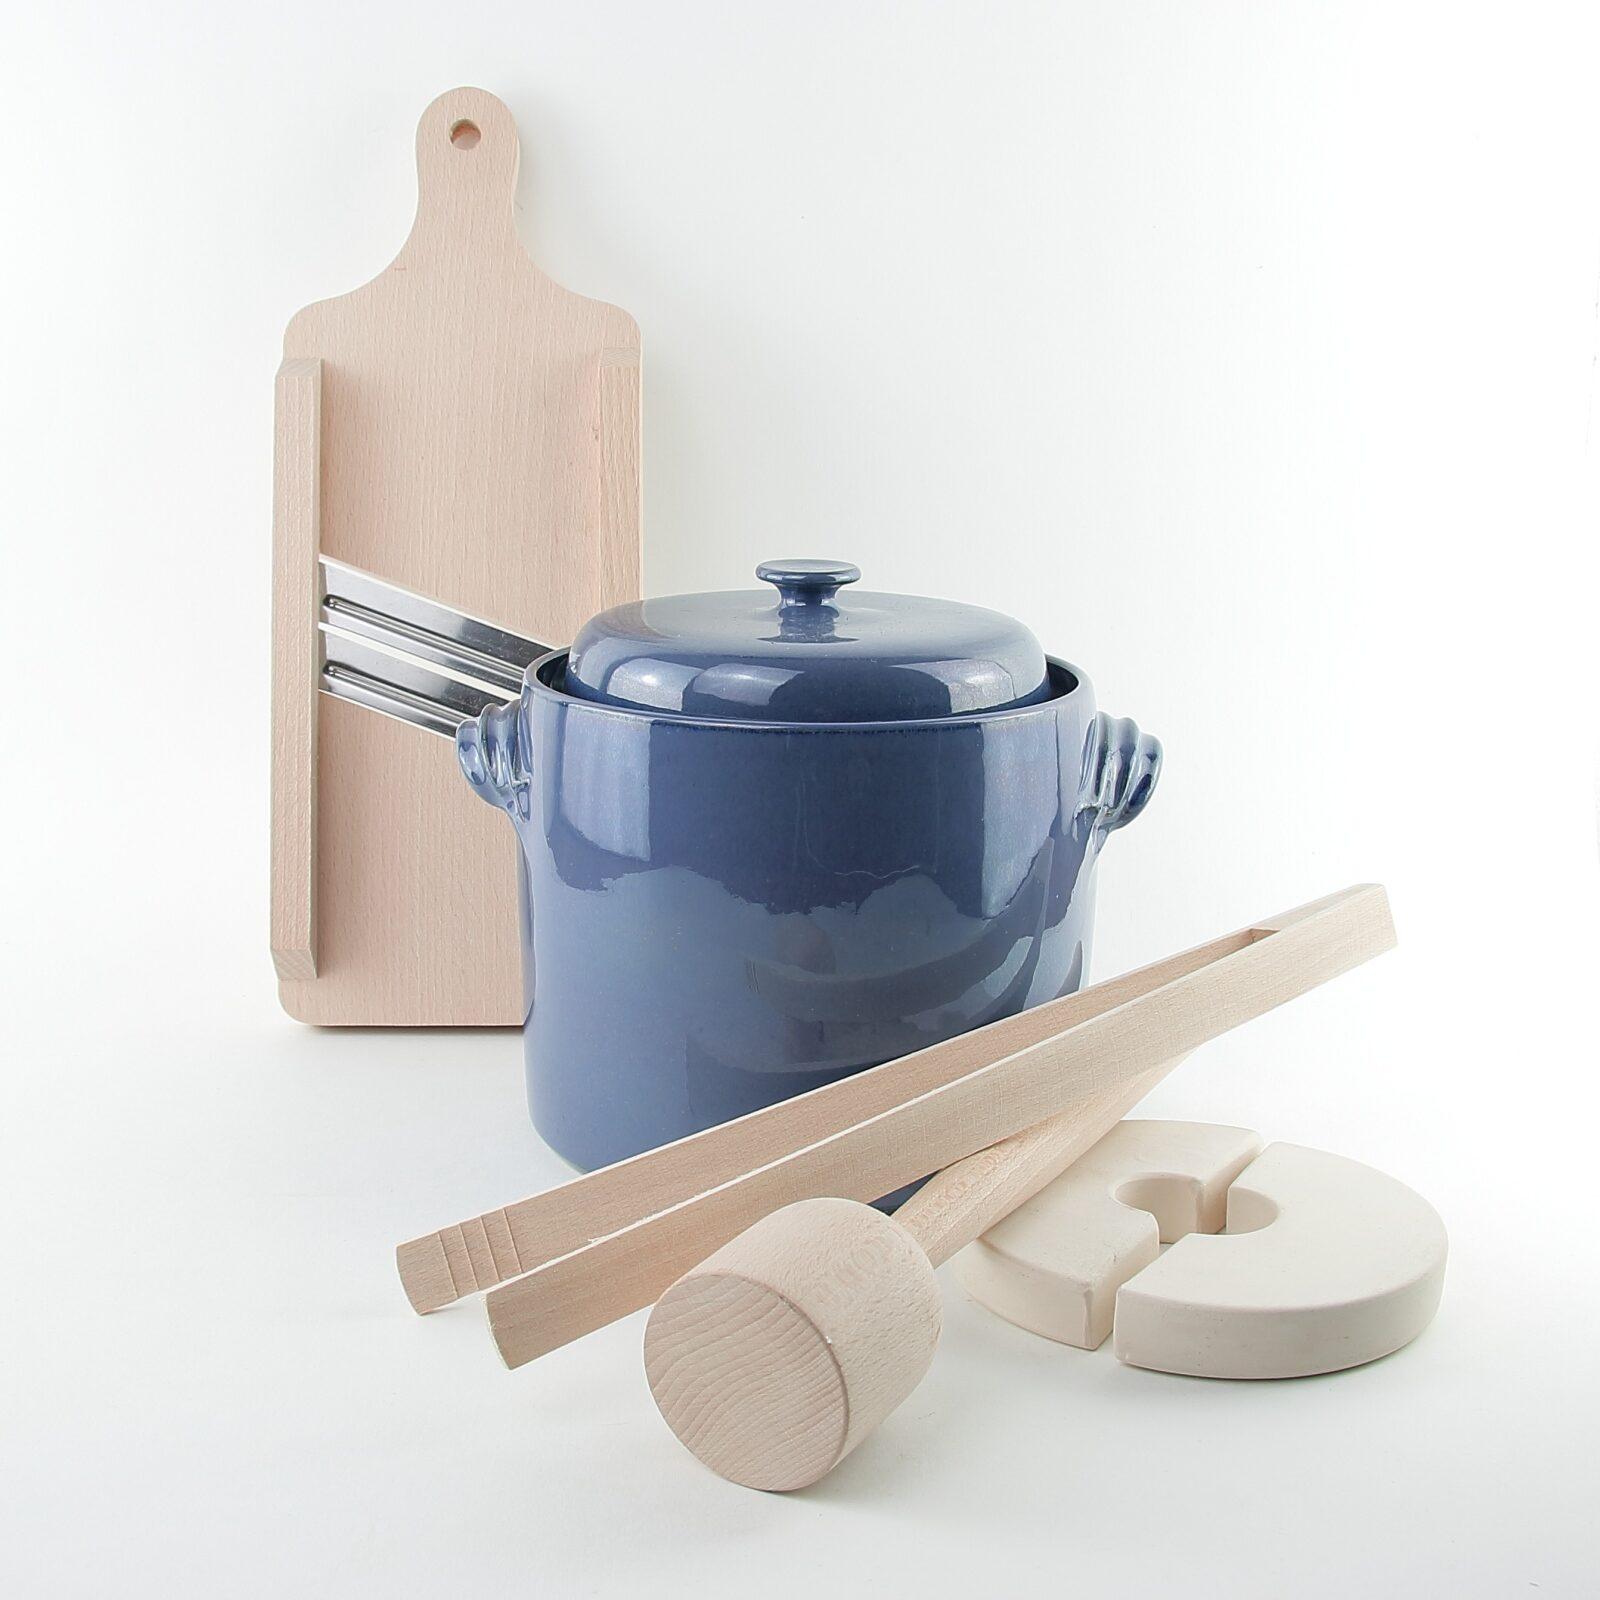 2 litre handmade ceramic sauerkraut crocks with wooden tools